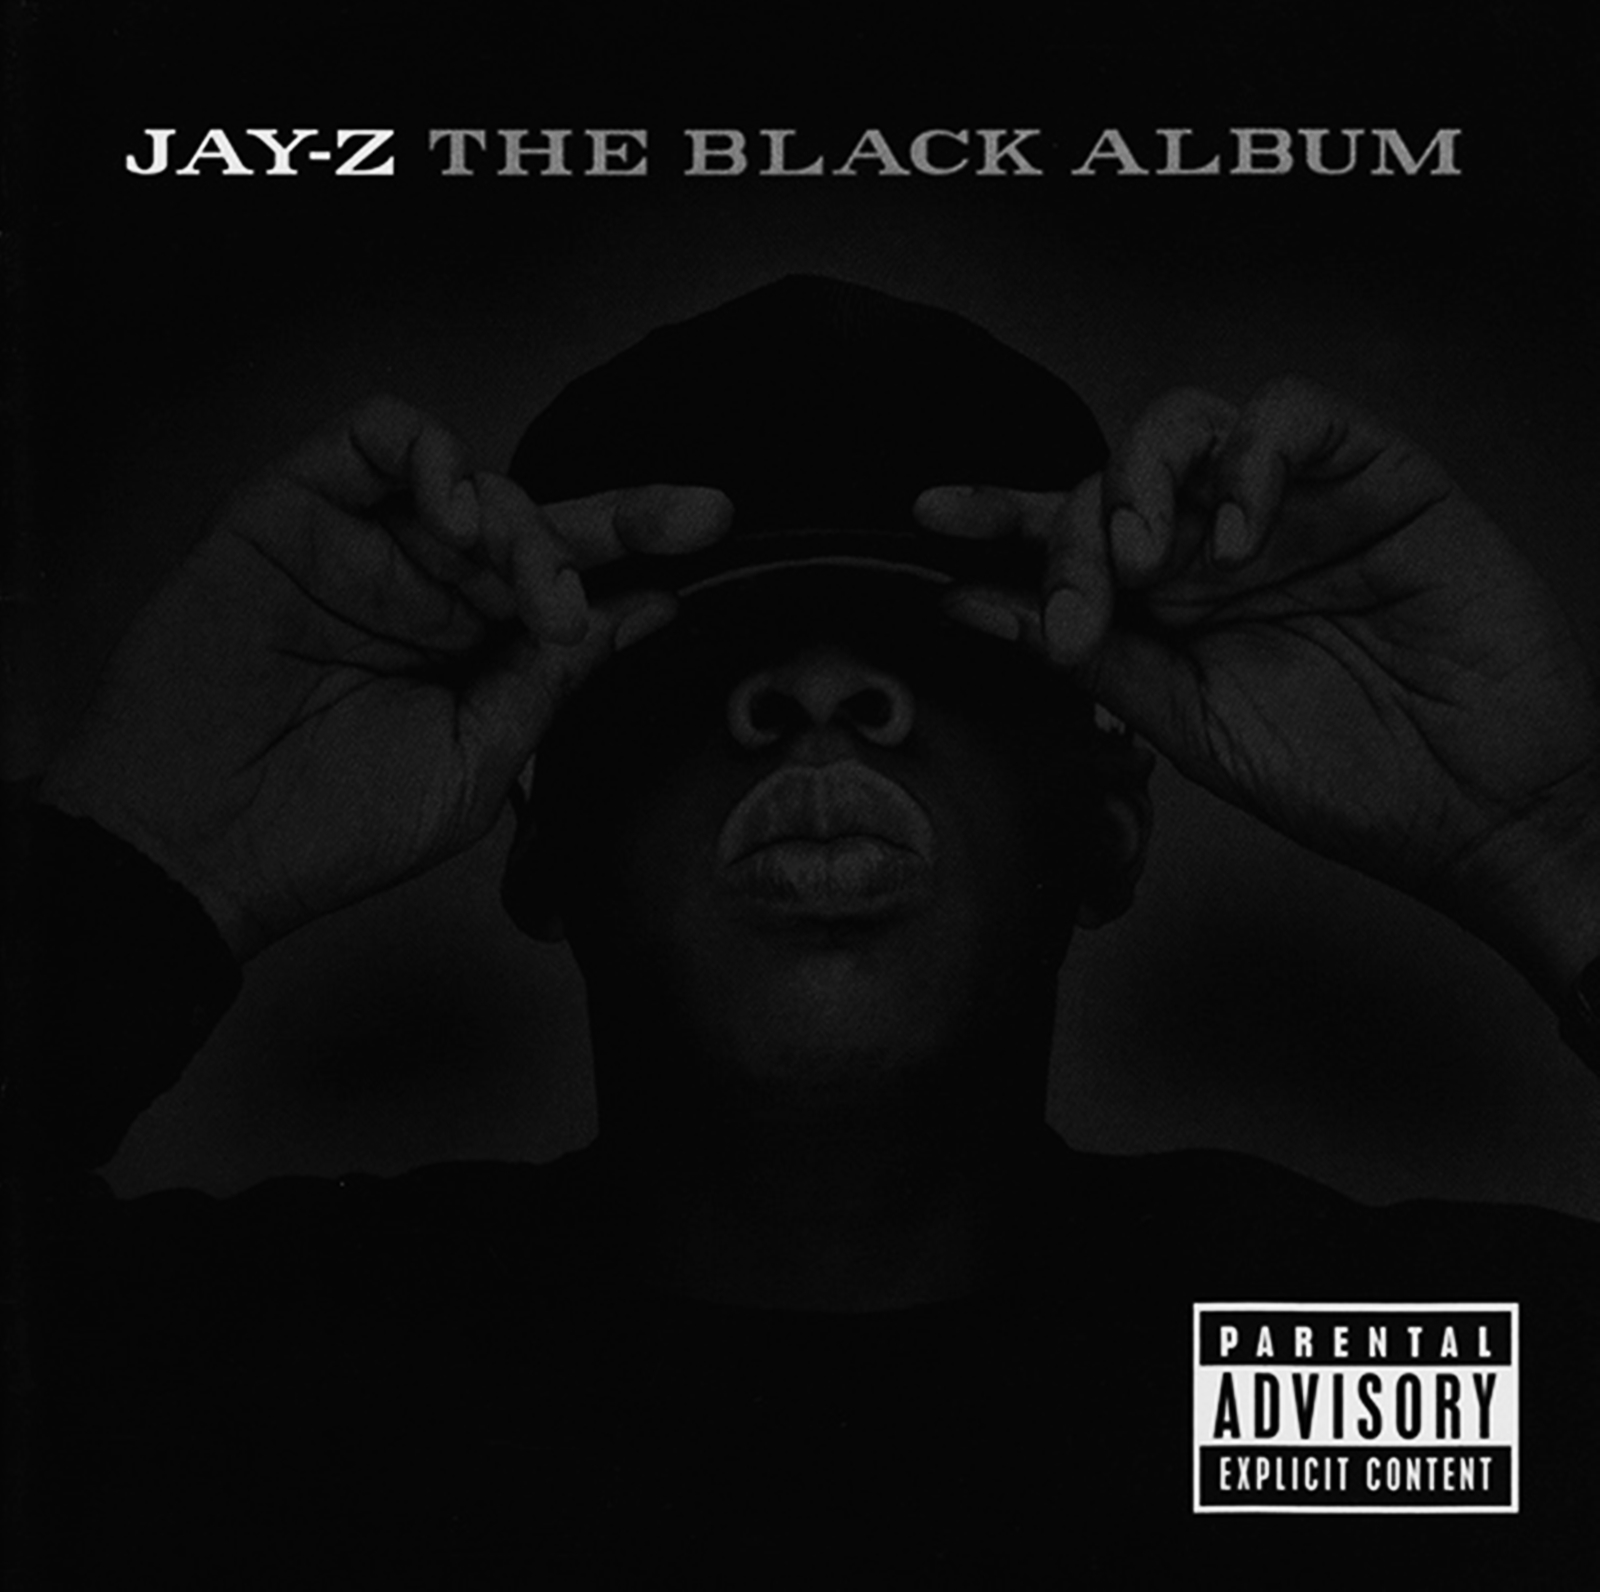 Mundo Dos Encartes / World Of Booklets: Jay-Z - The Black Album (2003)